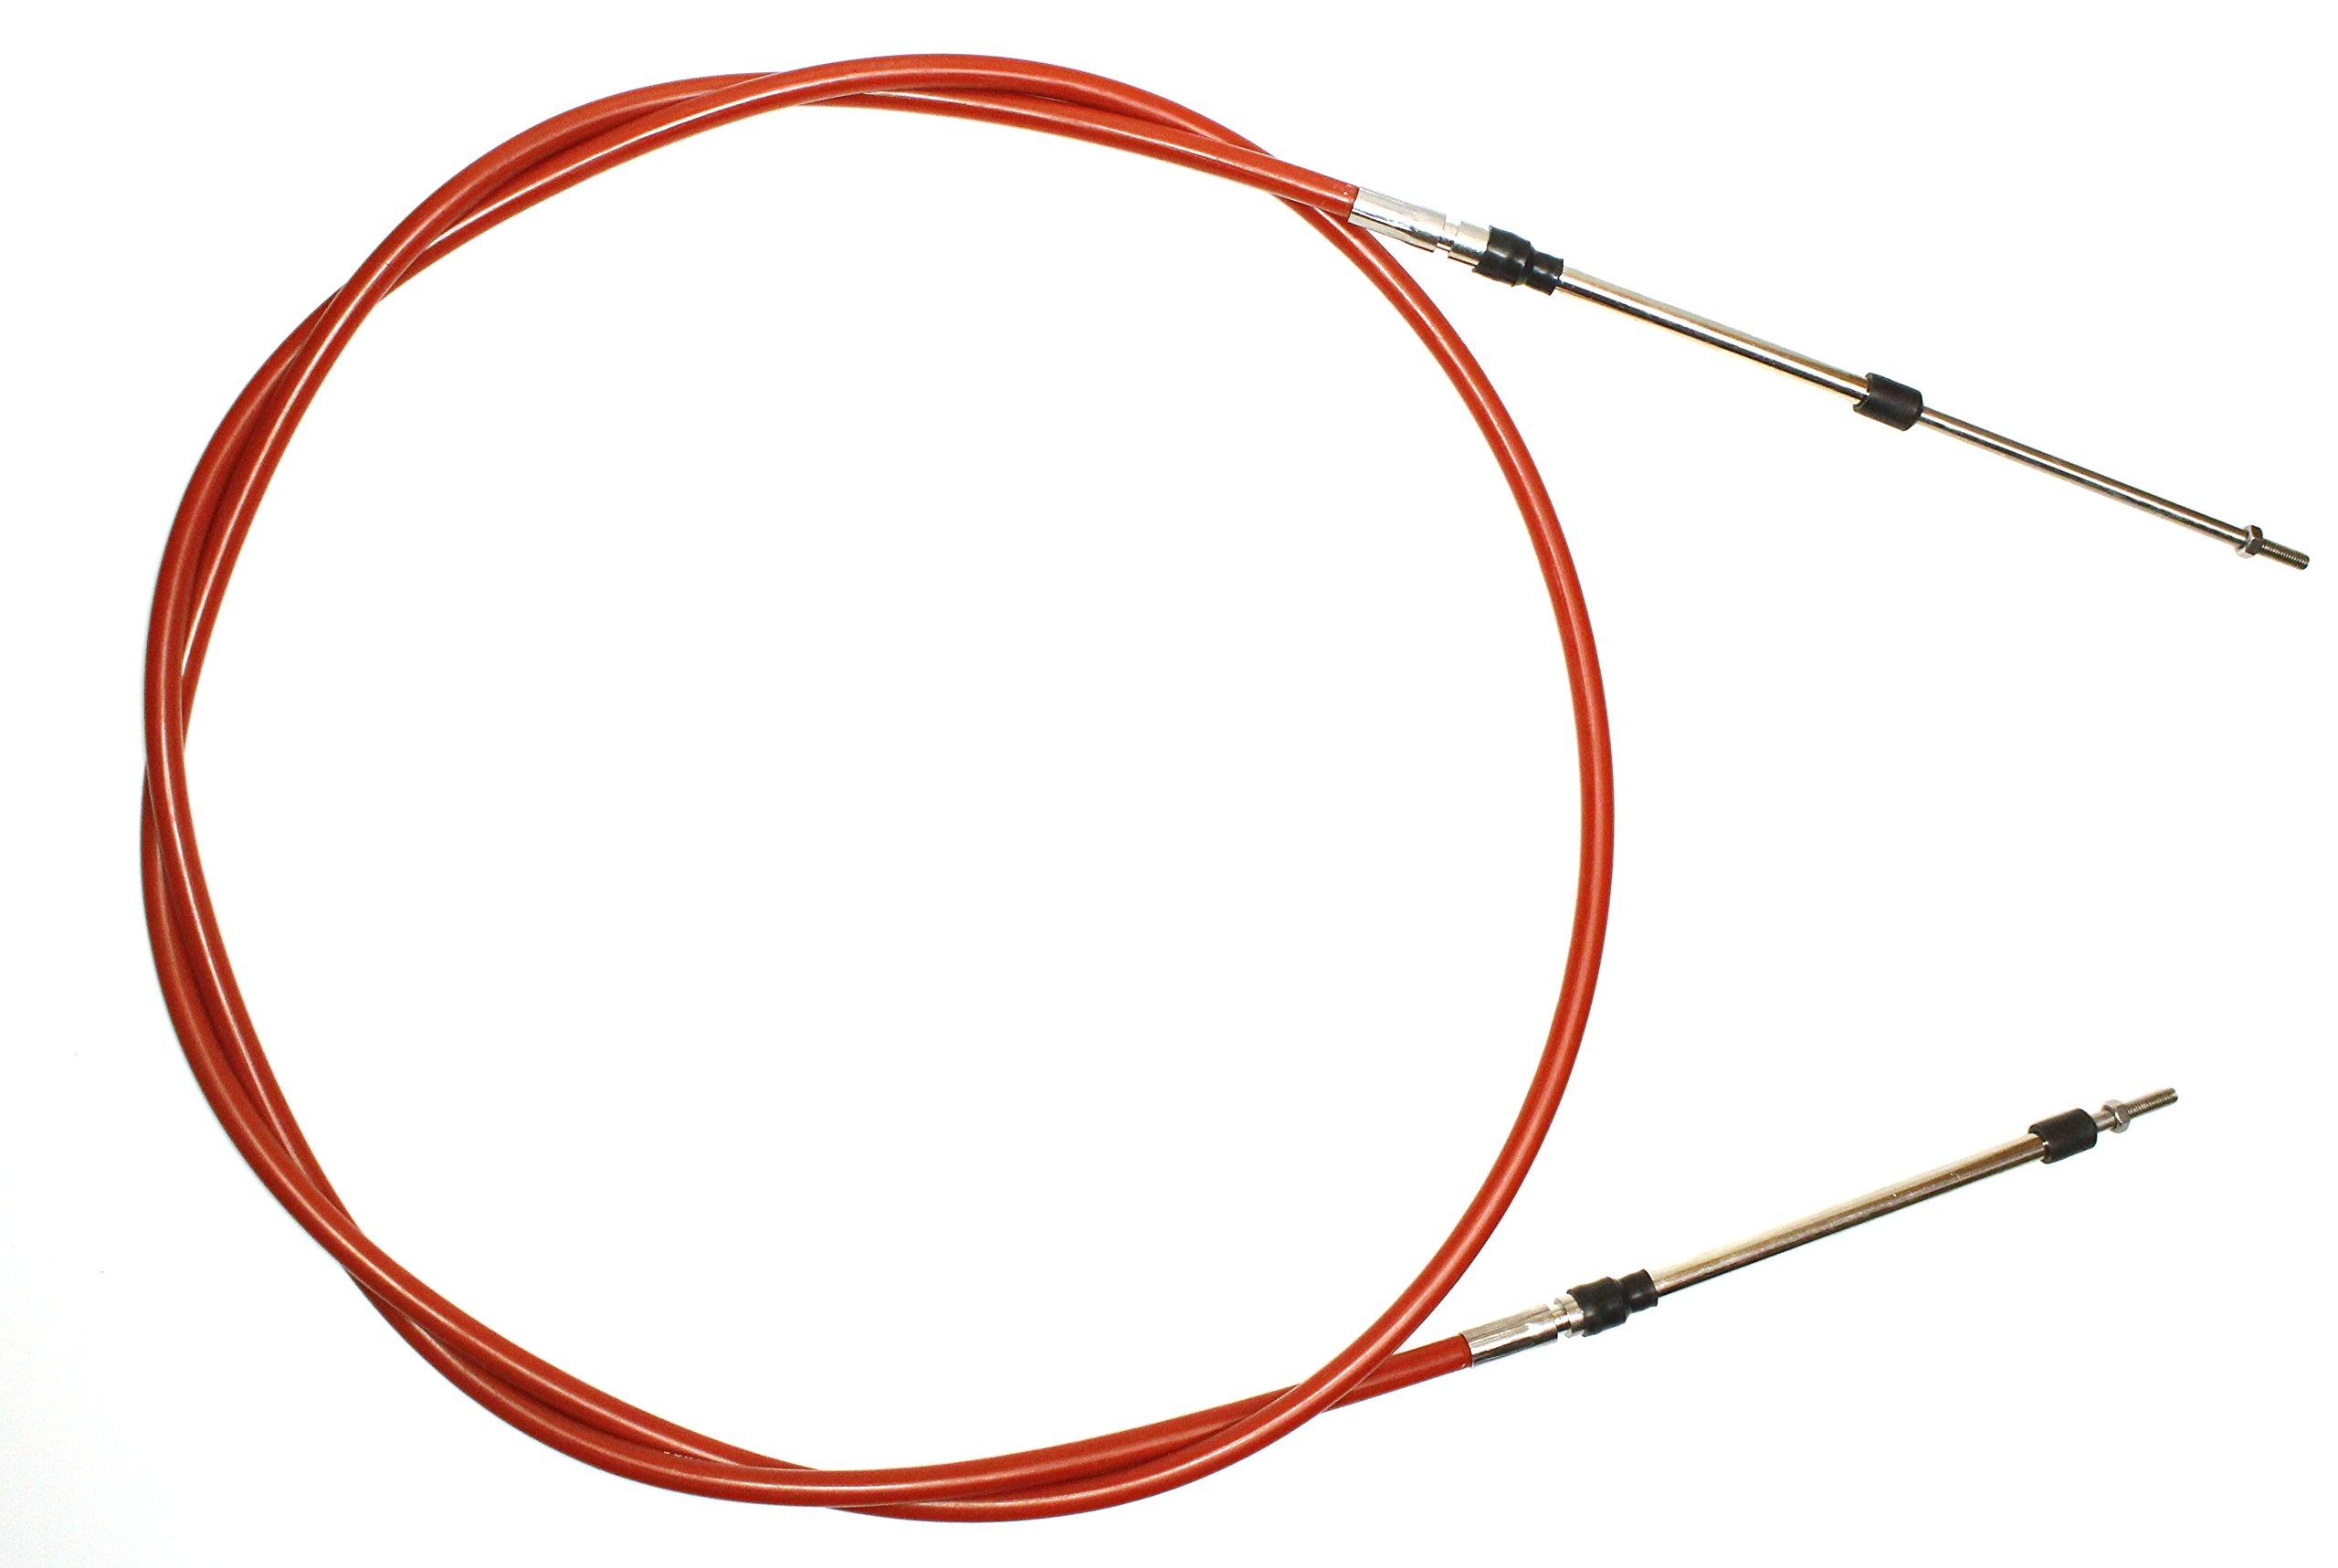 Yamaha Steering Cable Wave Blaster 760 GK5-61480-00-00 1996 1997